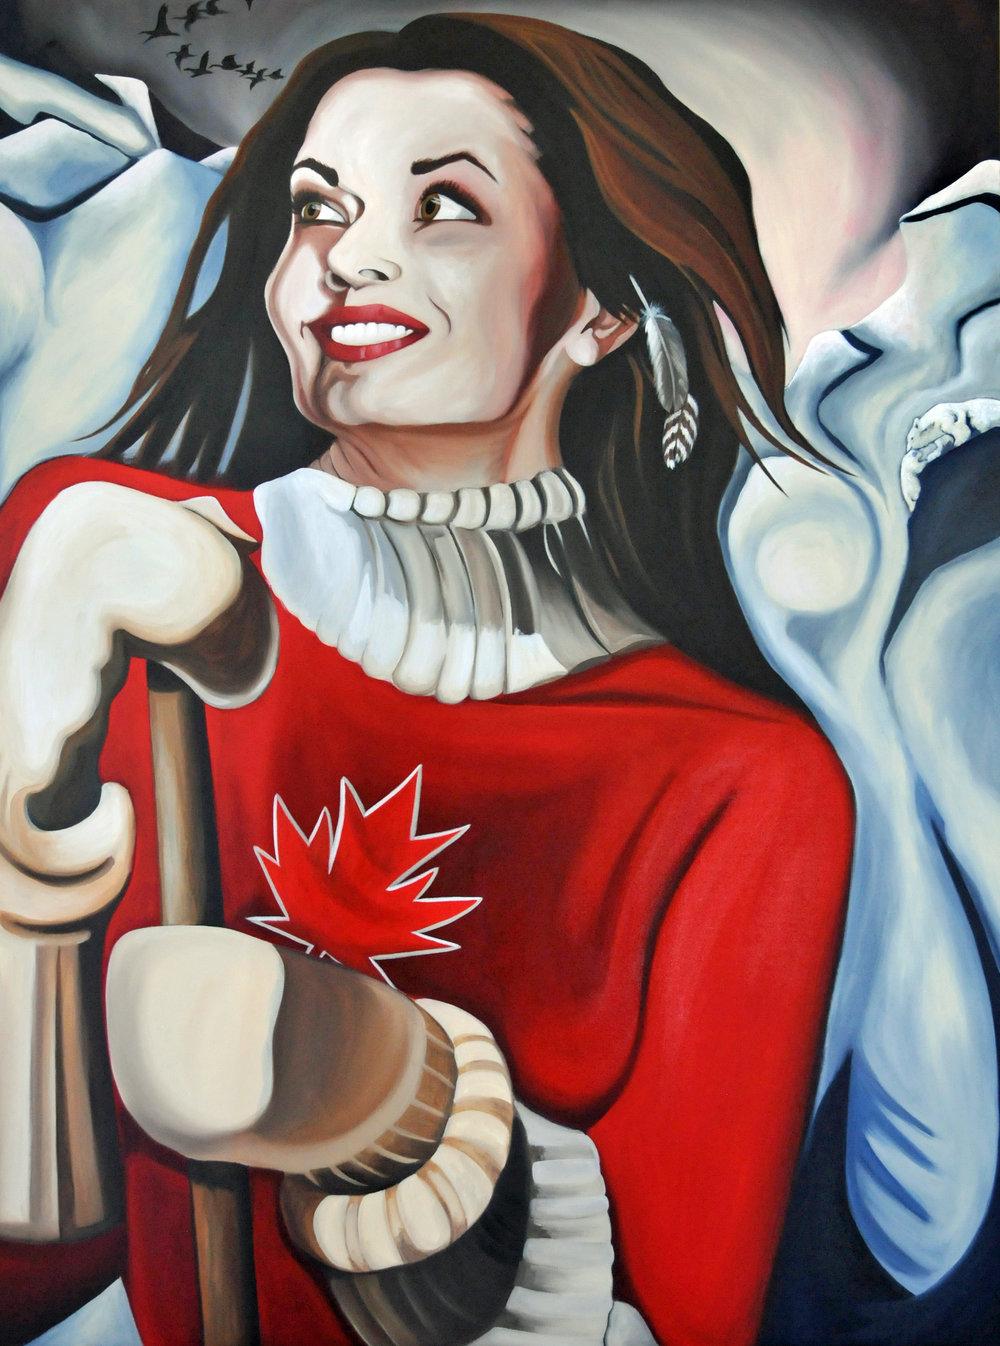 Saint Kanata, acrylic on canvas, 2011 - Brandy Saturley, Canadian Painter